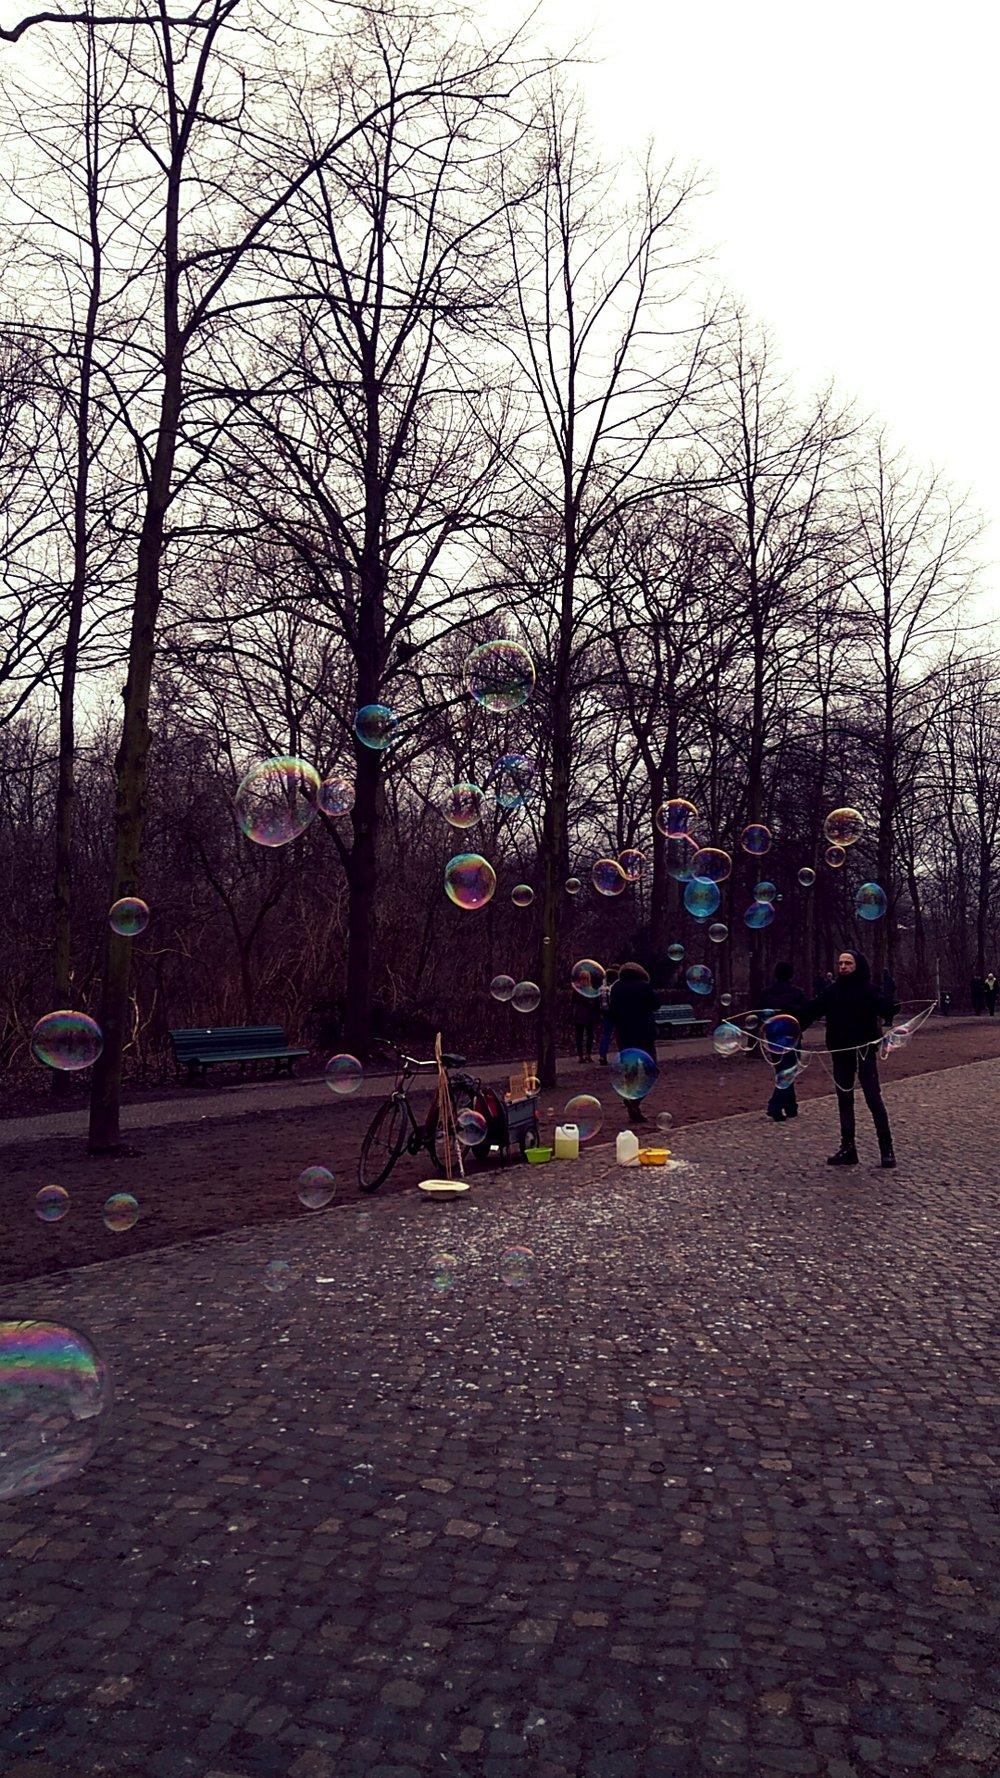 Bubbles blown behind Brandenburger Tor